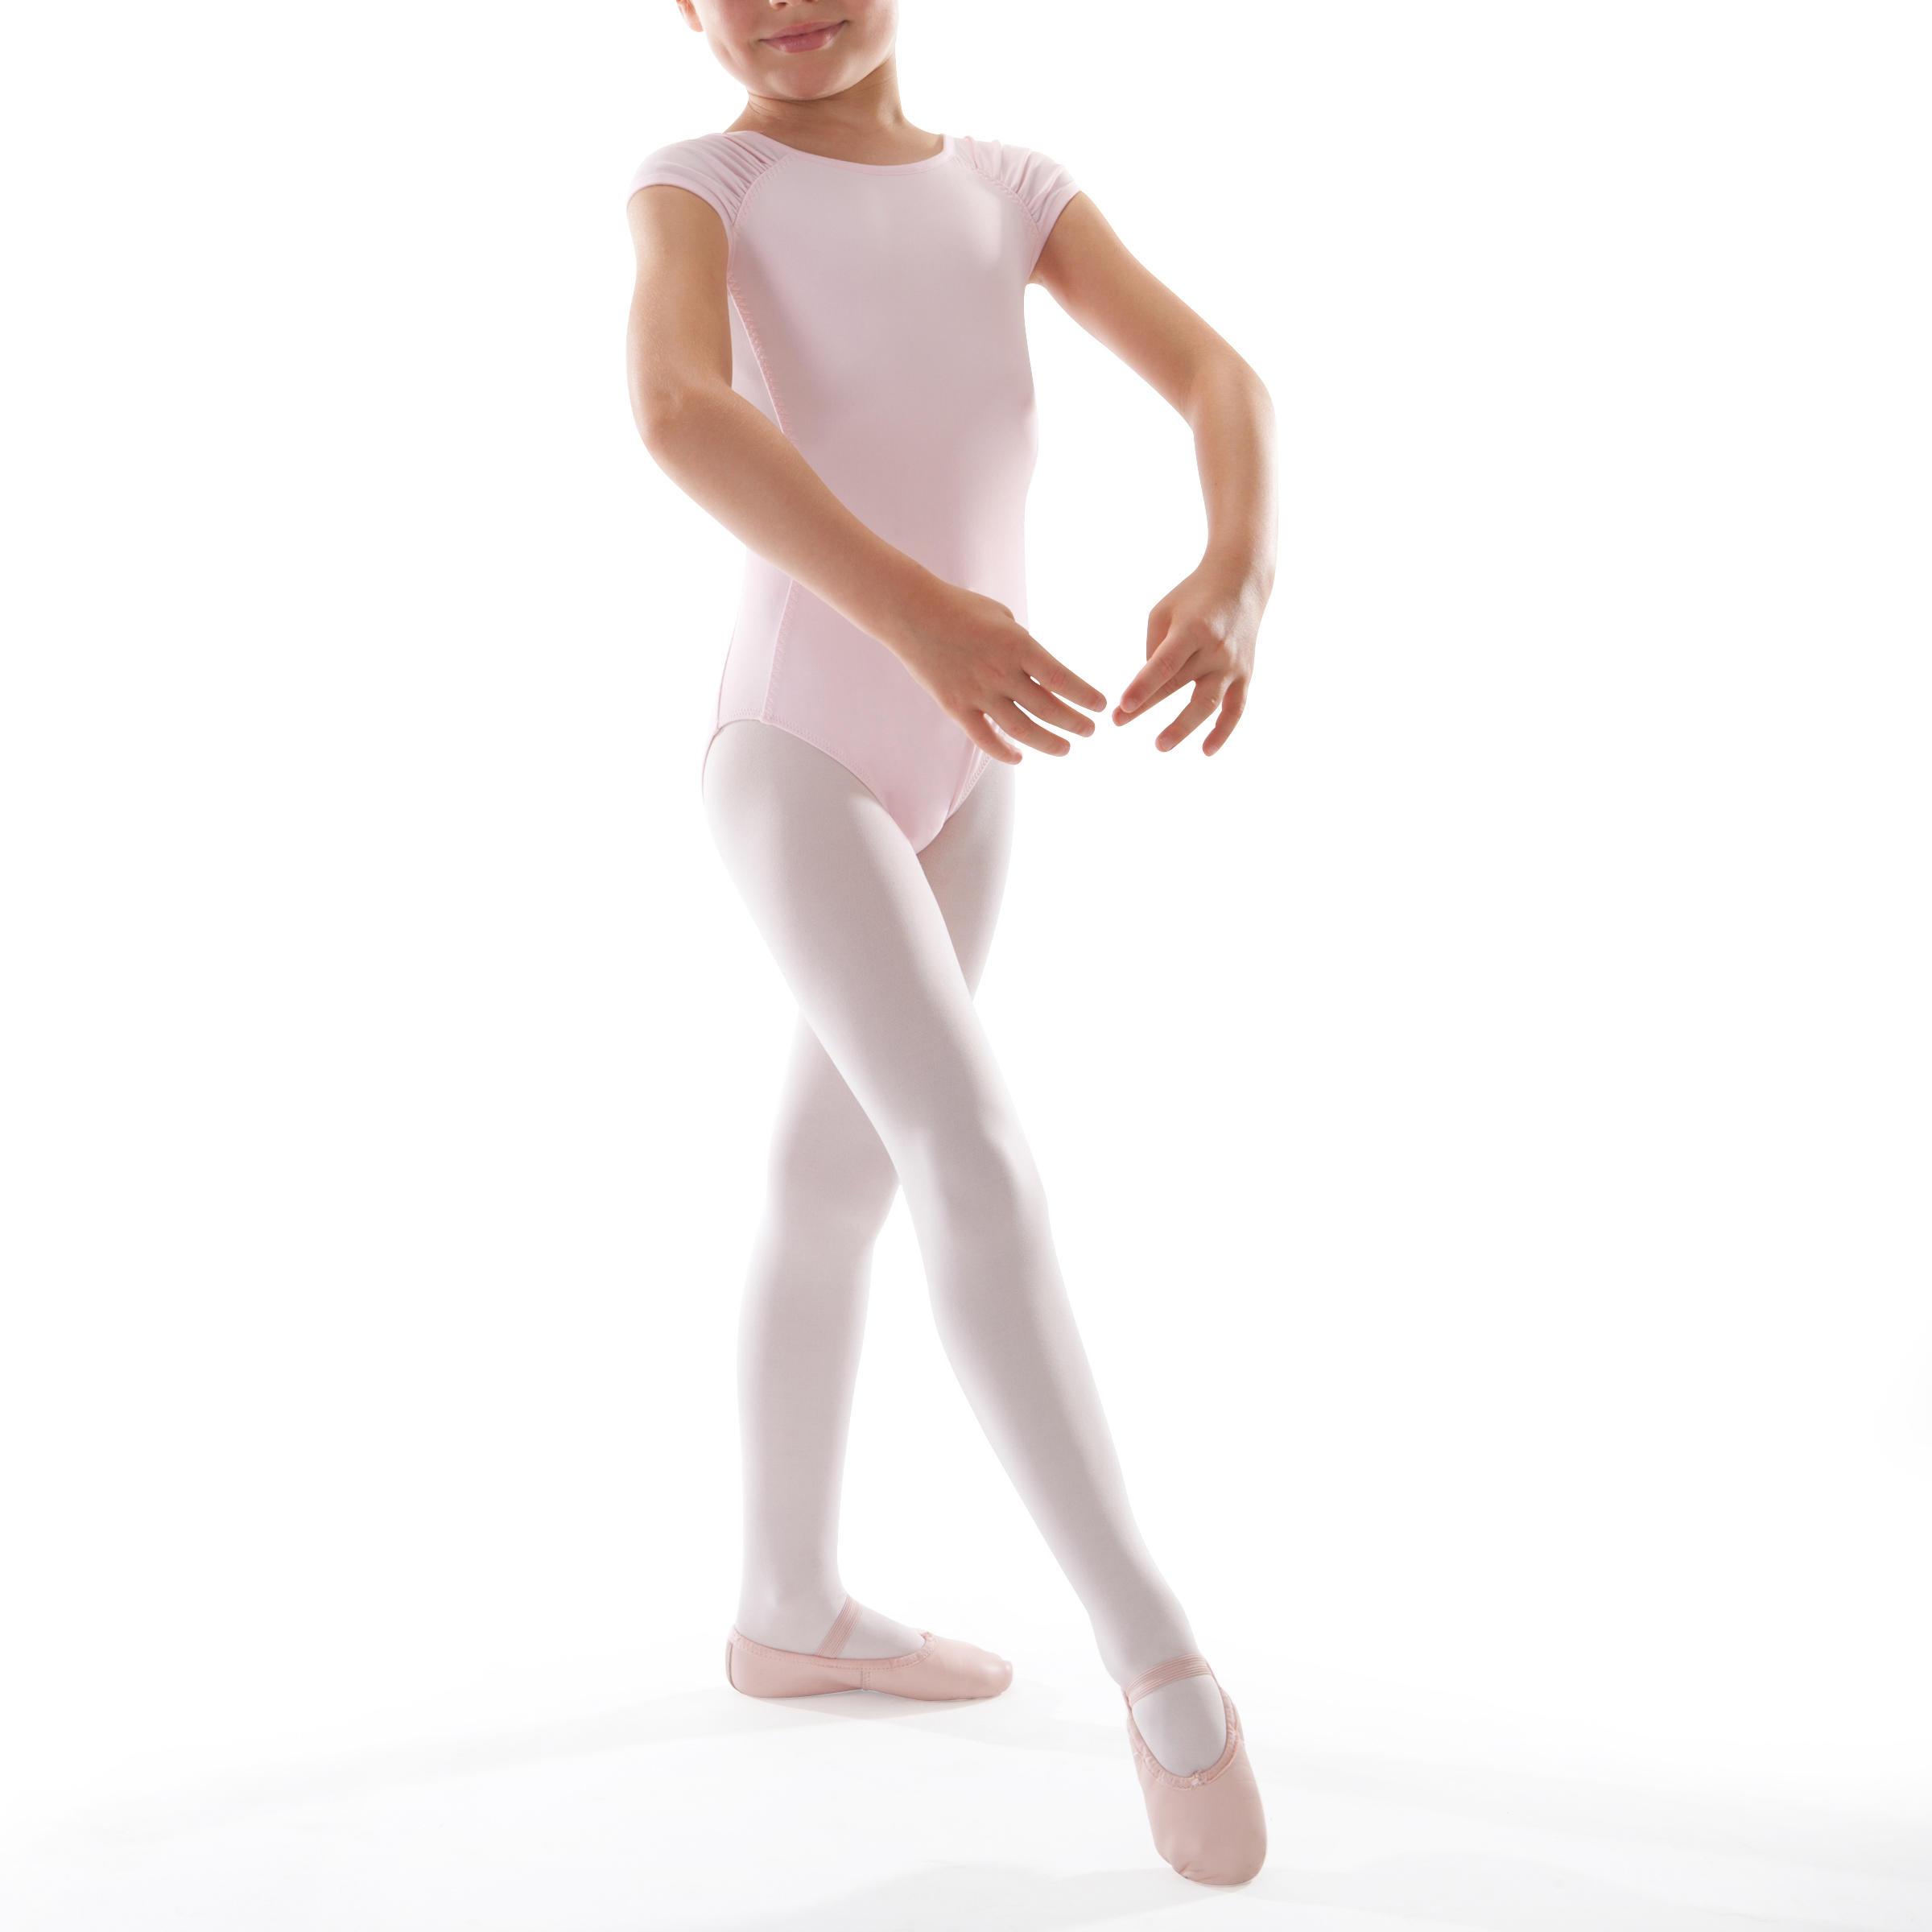 Girls' Short-Sleeved Ballet Leotard - Pink